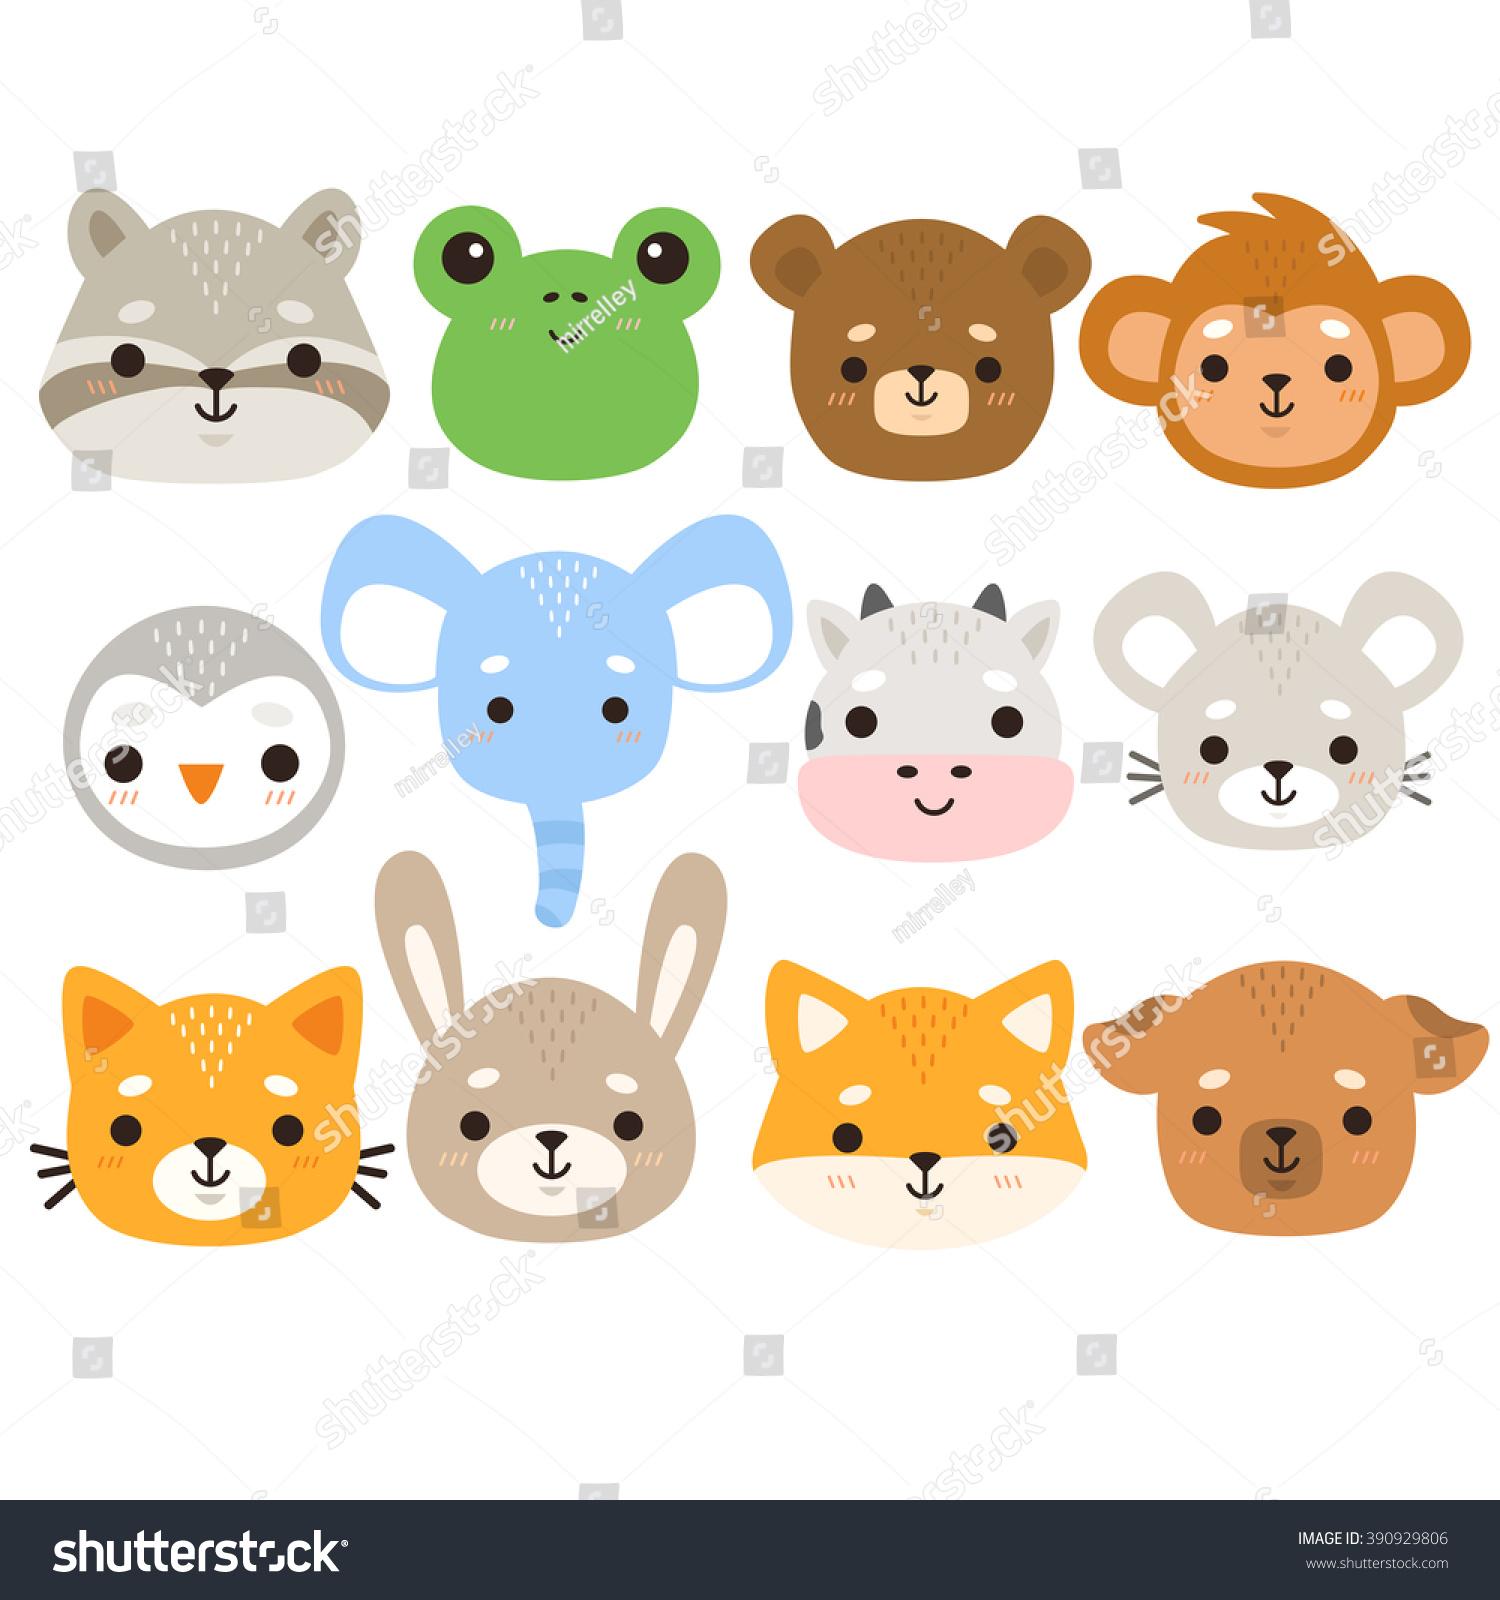 Set Twelve Illustration Cute Cartoon Baby Stock Vector 390929806 - Shutterstock